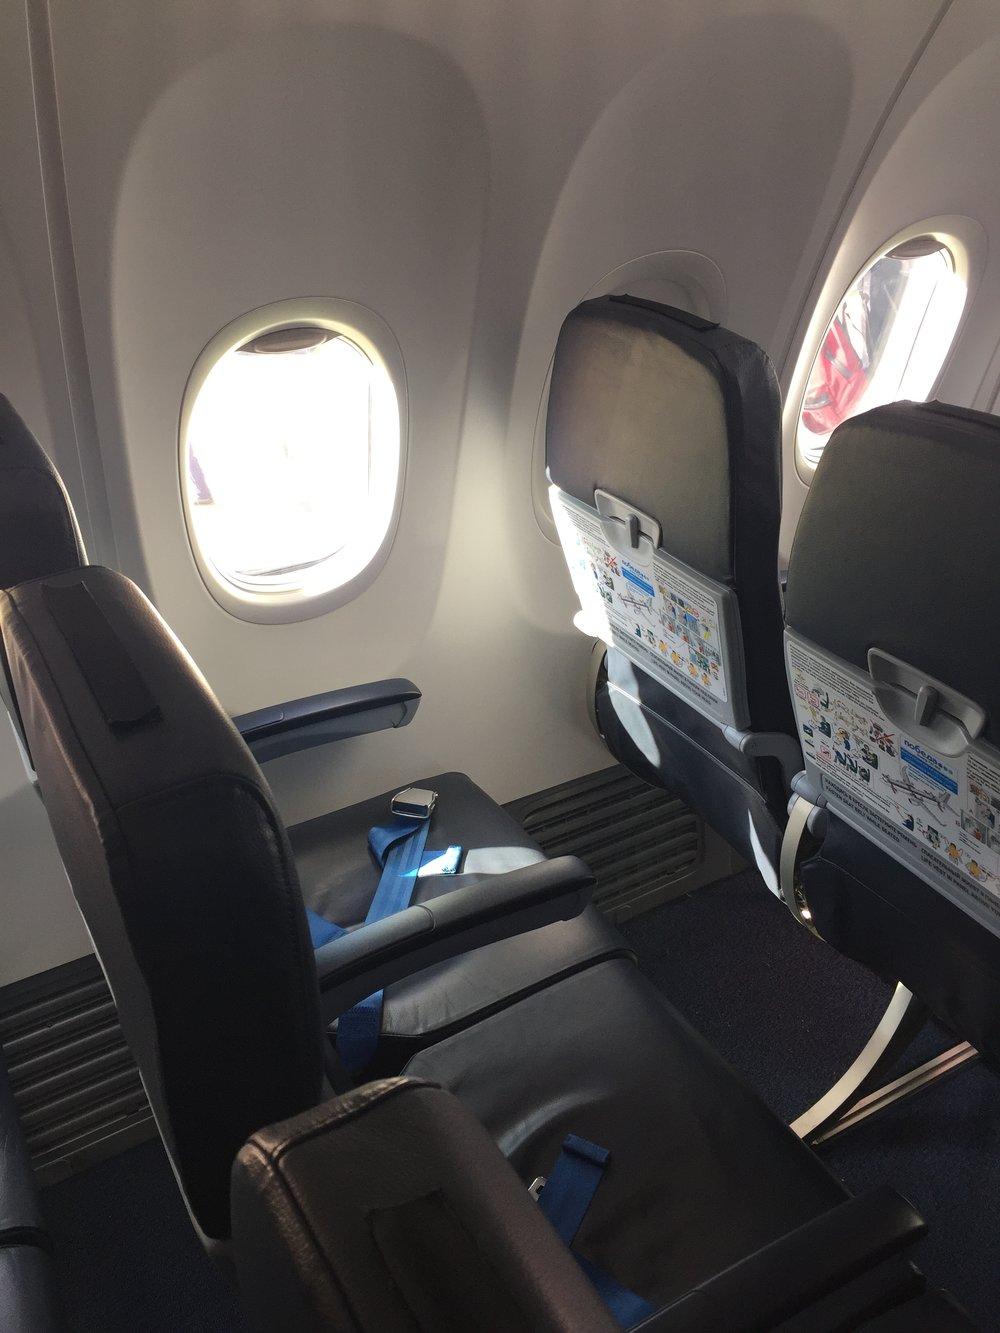 pobeda airlines seats.JPG